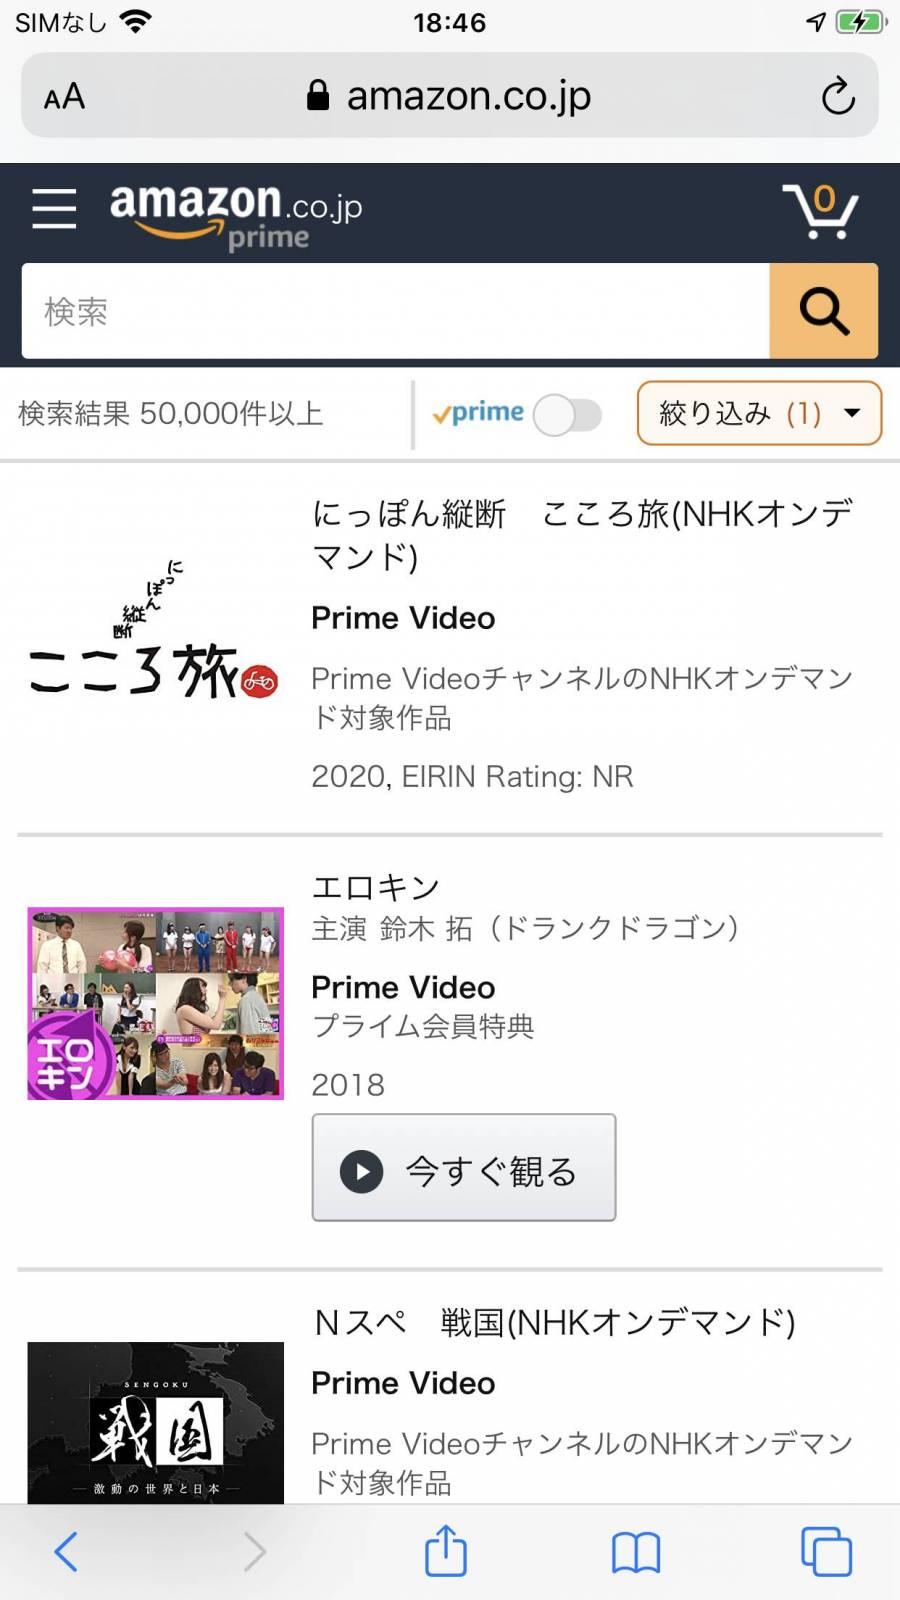 『Amazonプライム・ビデオ』Web版 検索結果画面(新着順)